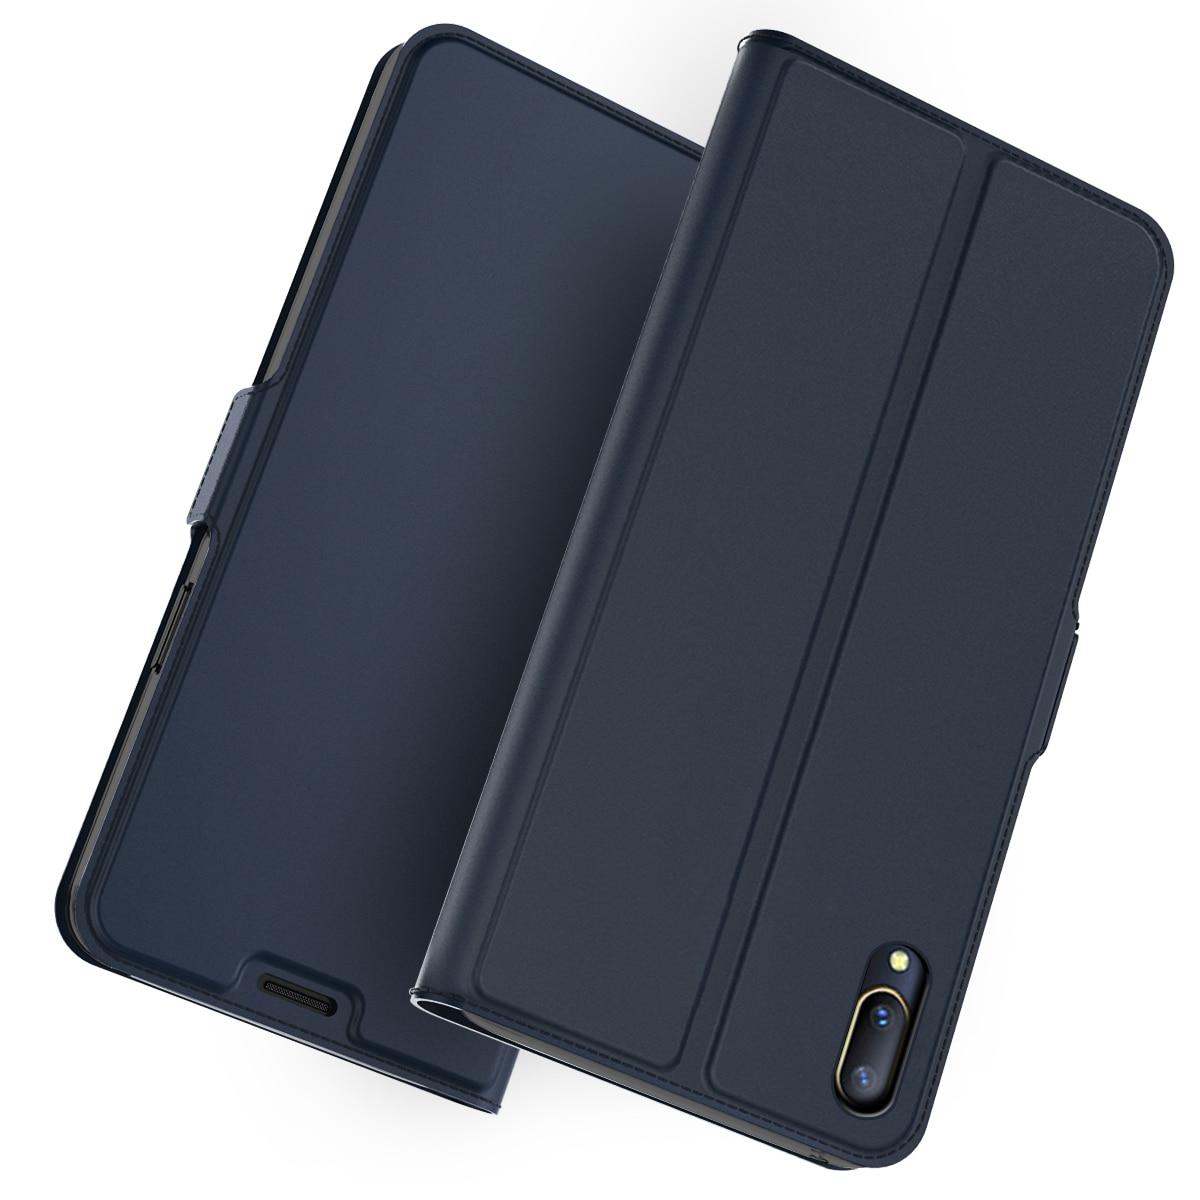 For Vivo V11 Pro/Vivo NEX S/NEX A Phone Case PU Leather Flip Stand Wallet Case For Vivo Y83/Z1/Y93/Y53/Y97/X23 Phone CoverFor Vivo V11 Pro/Vivo NEX S/NEX A Phone Case PU Leather Flip Stand Wallet Case For Vivo Y83/Z1/Y93/Y53/Y97/X23 Phone Cover